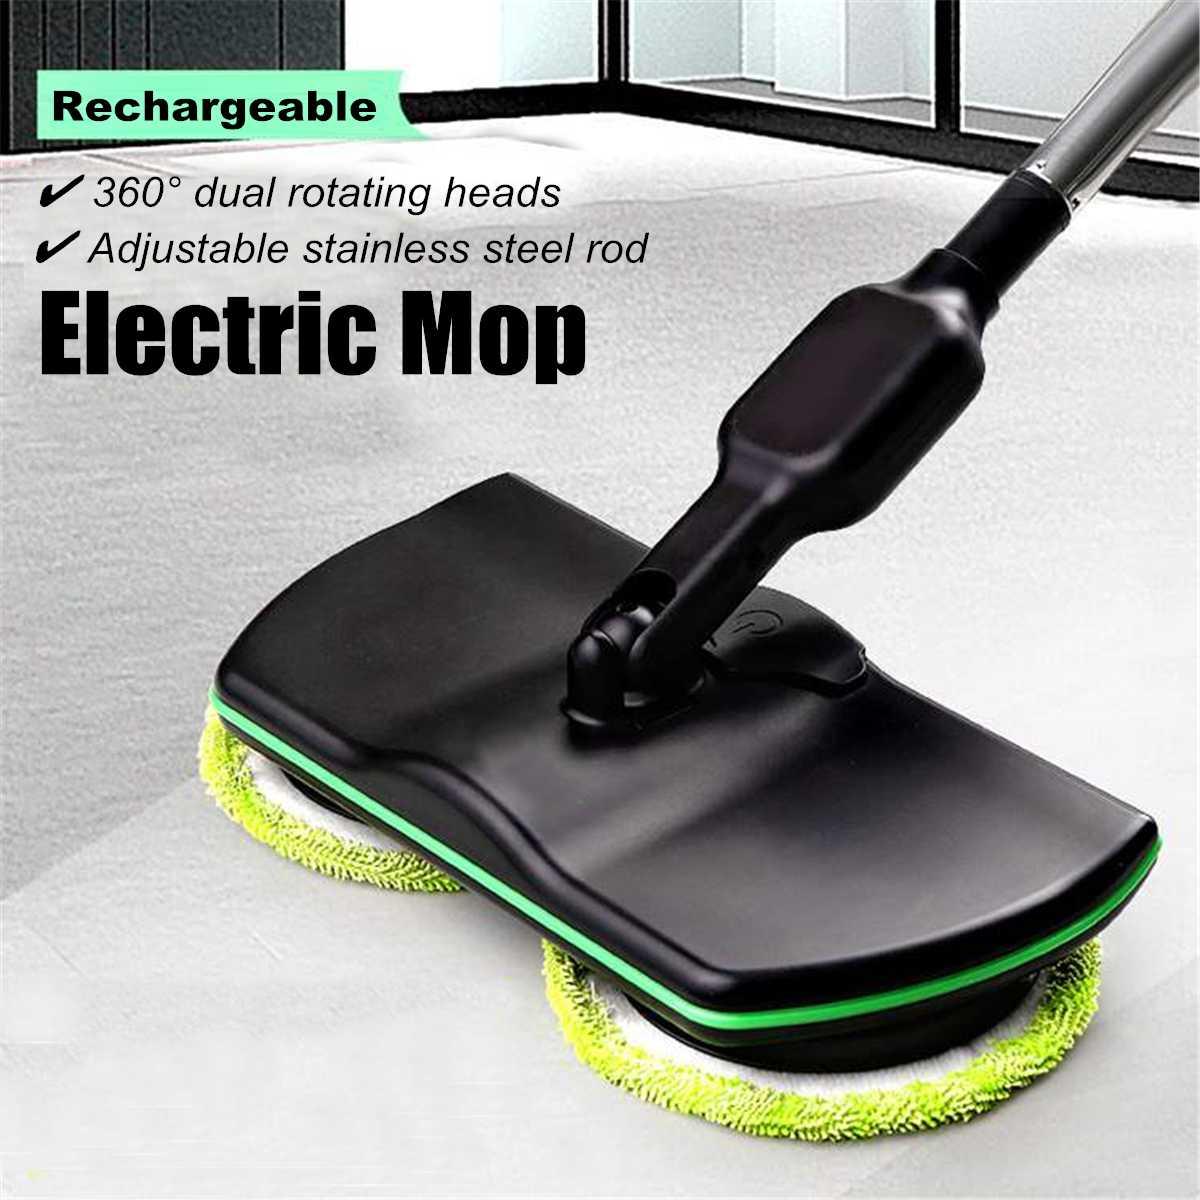 Rechargeable Floor Wiper Cordless Sweeping Handheld Wireless Electric Mop Floor Washer Wireless Rotating Electric Mop